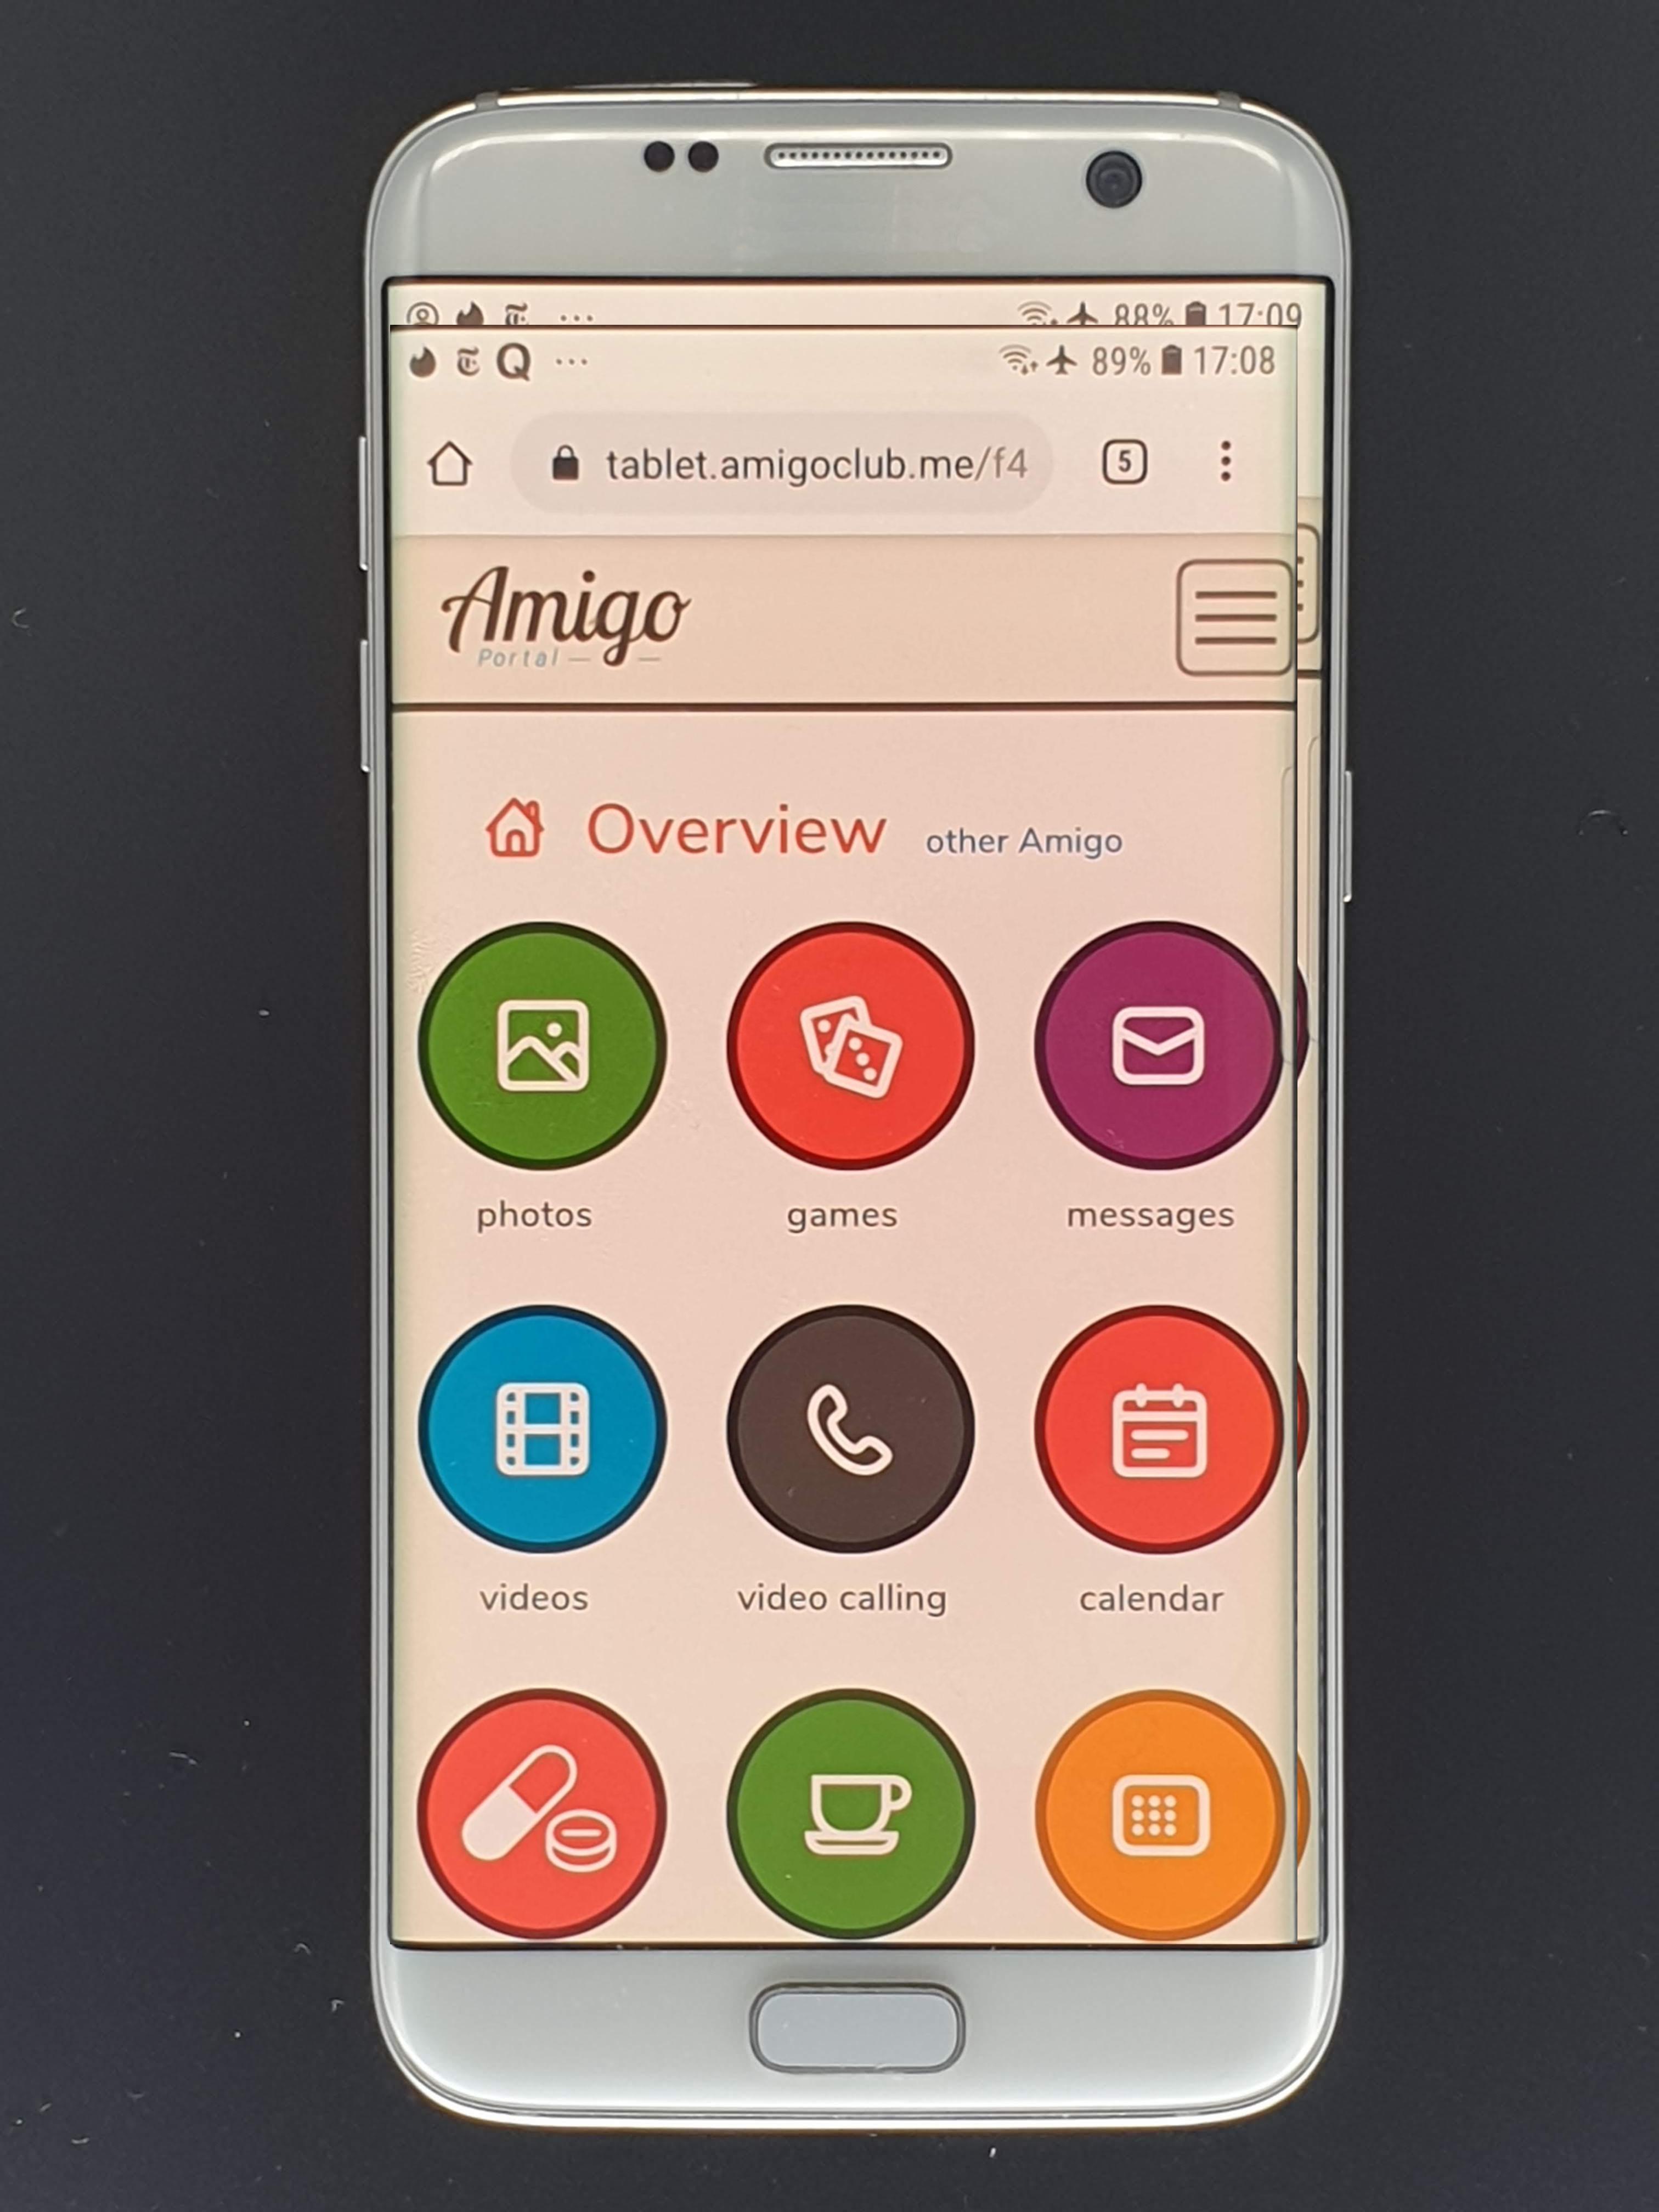 smartphone-main-screen-portal_en